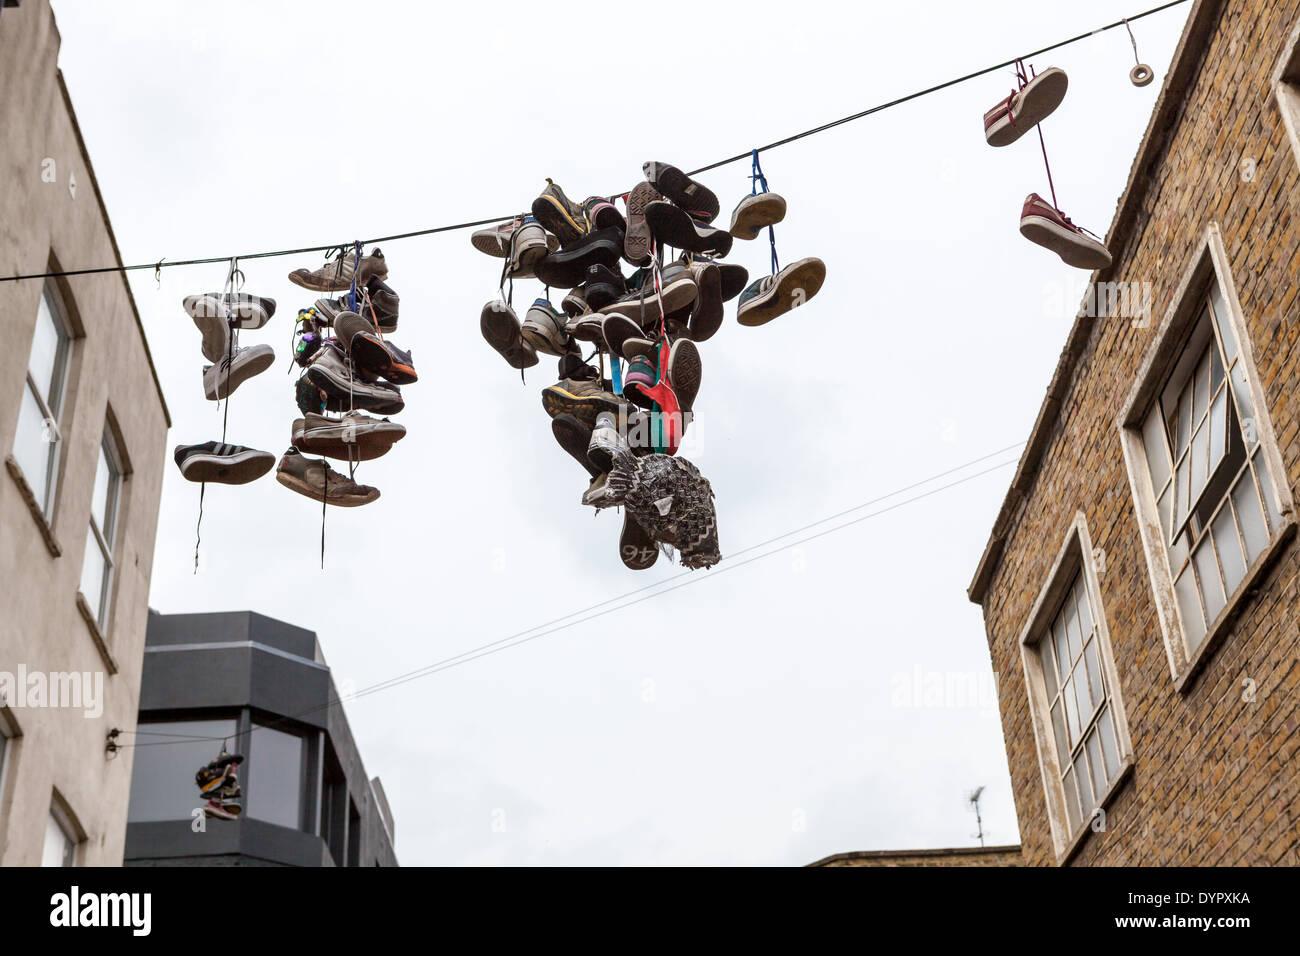 """shoefiti"": shoes + graffiti, in Shoreditch, London - Stock Image"